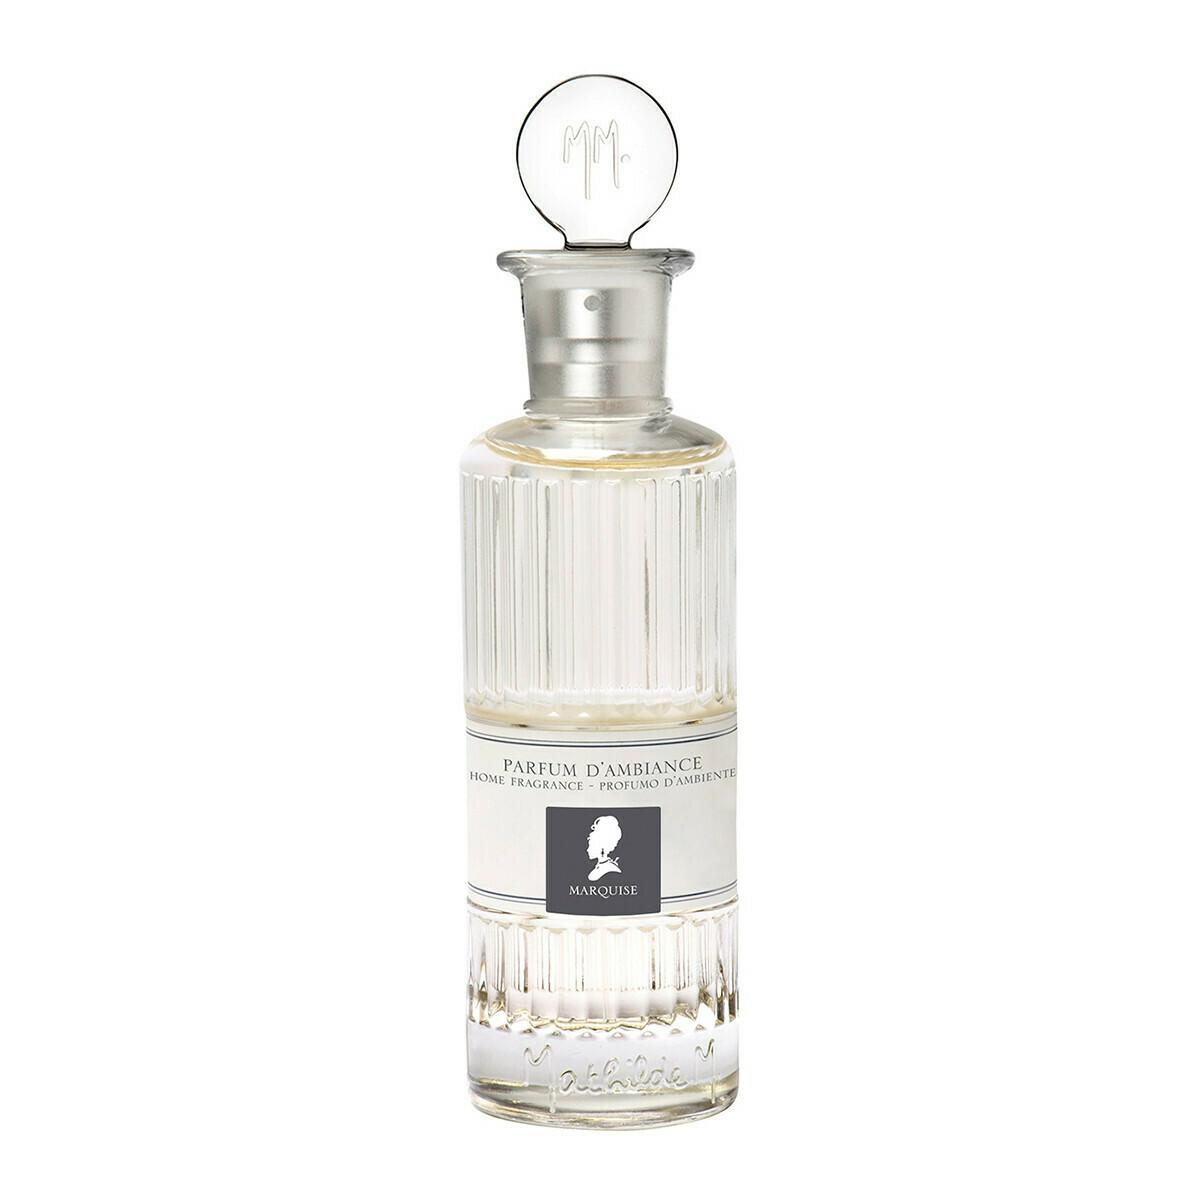 PARFUM D'AMBIANCE 100 ml - MARQUISE